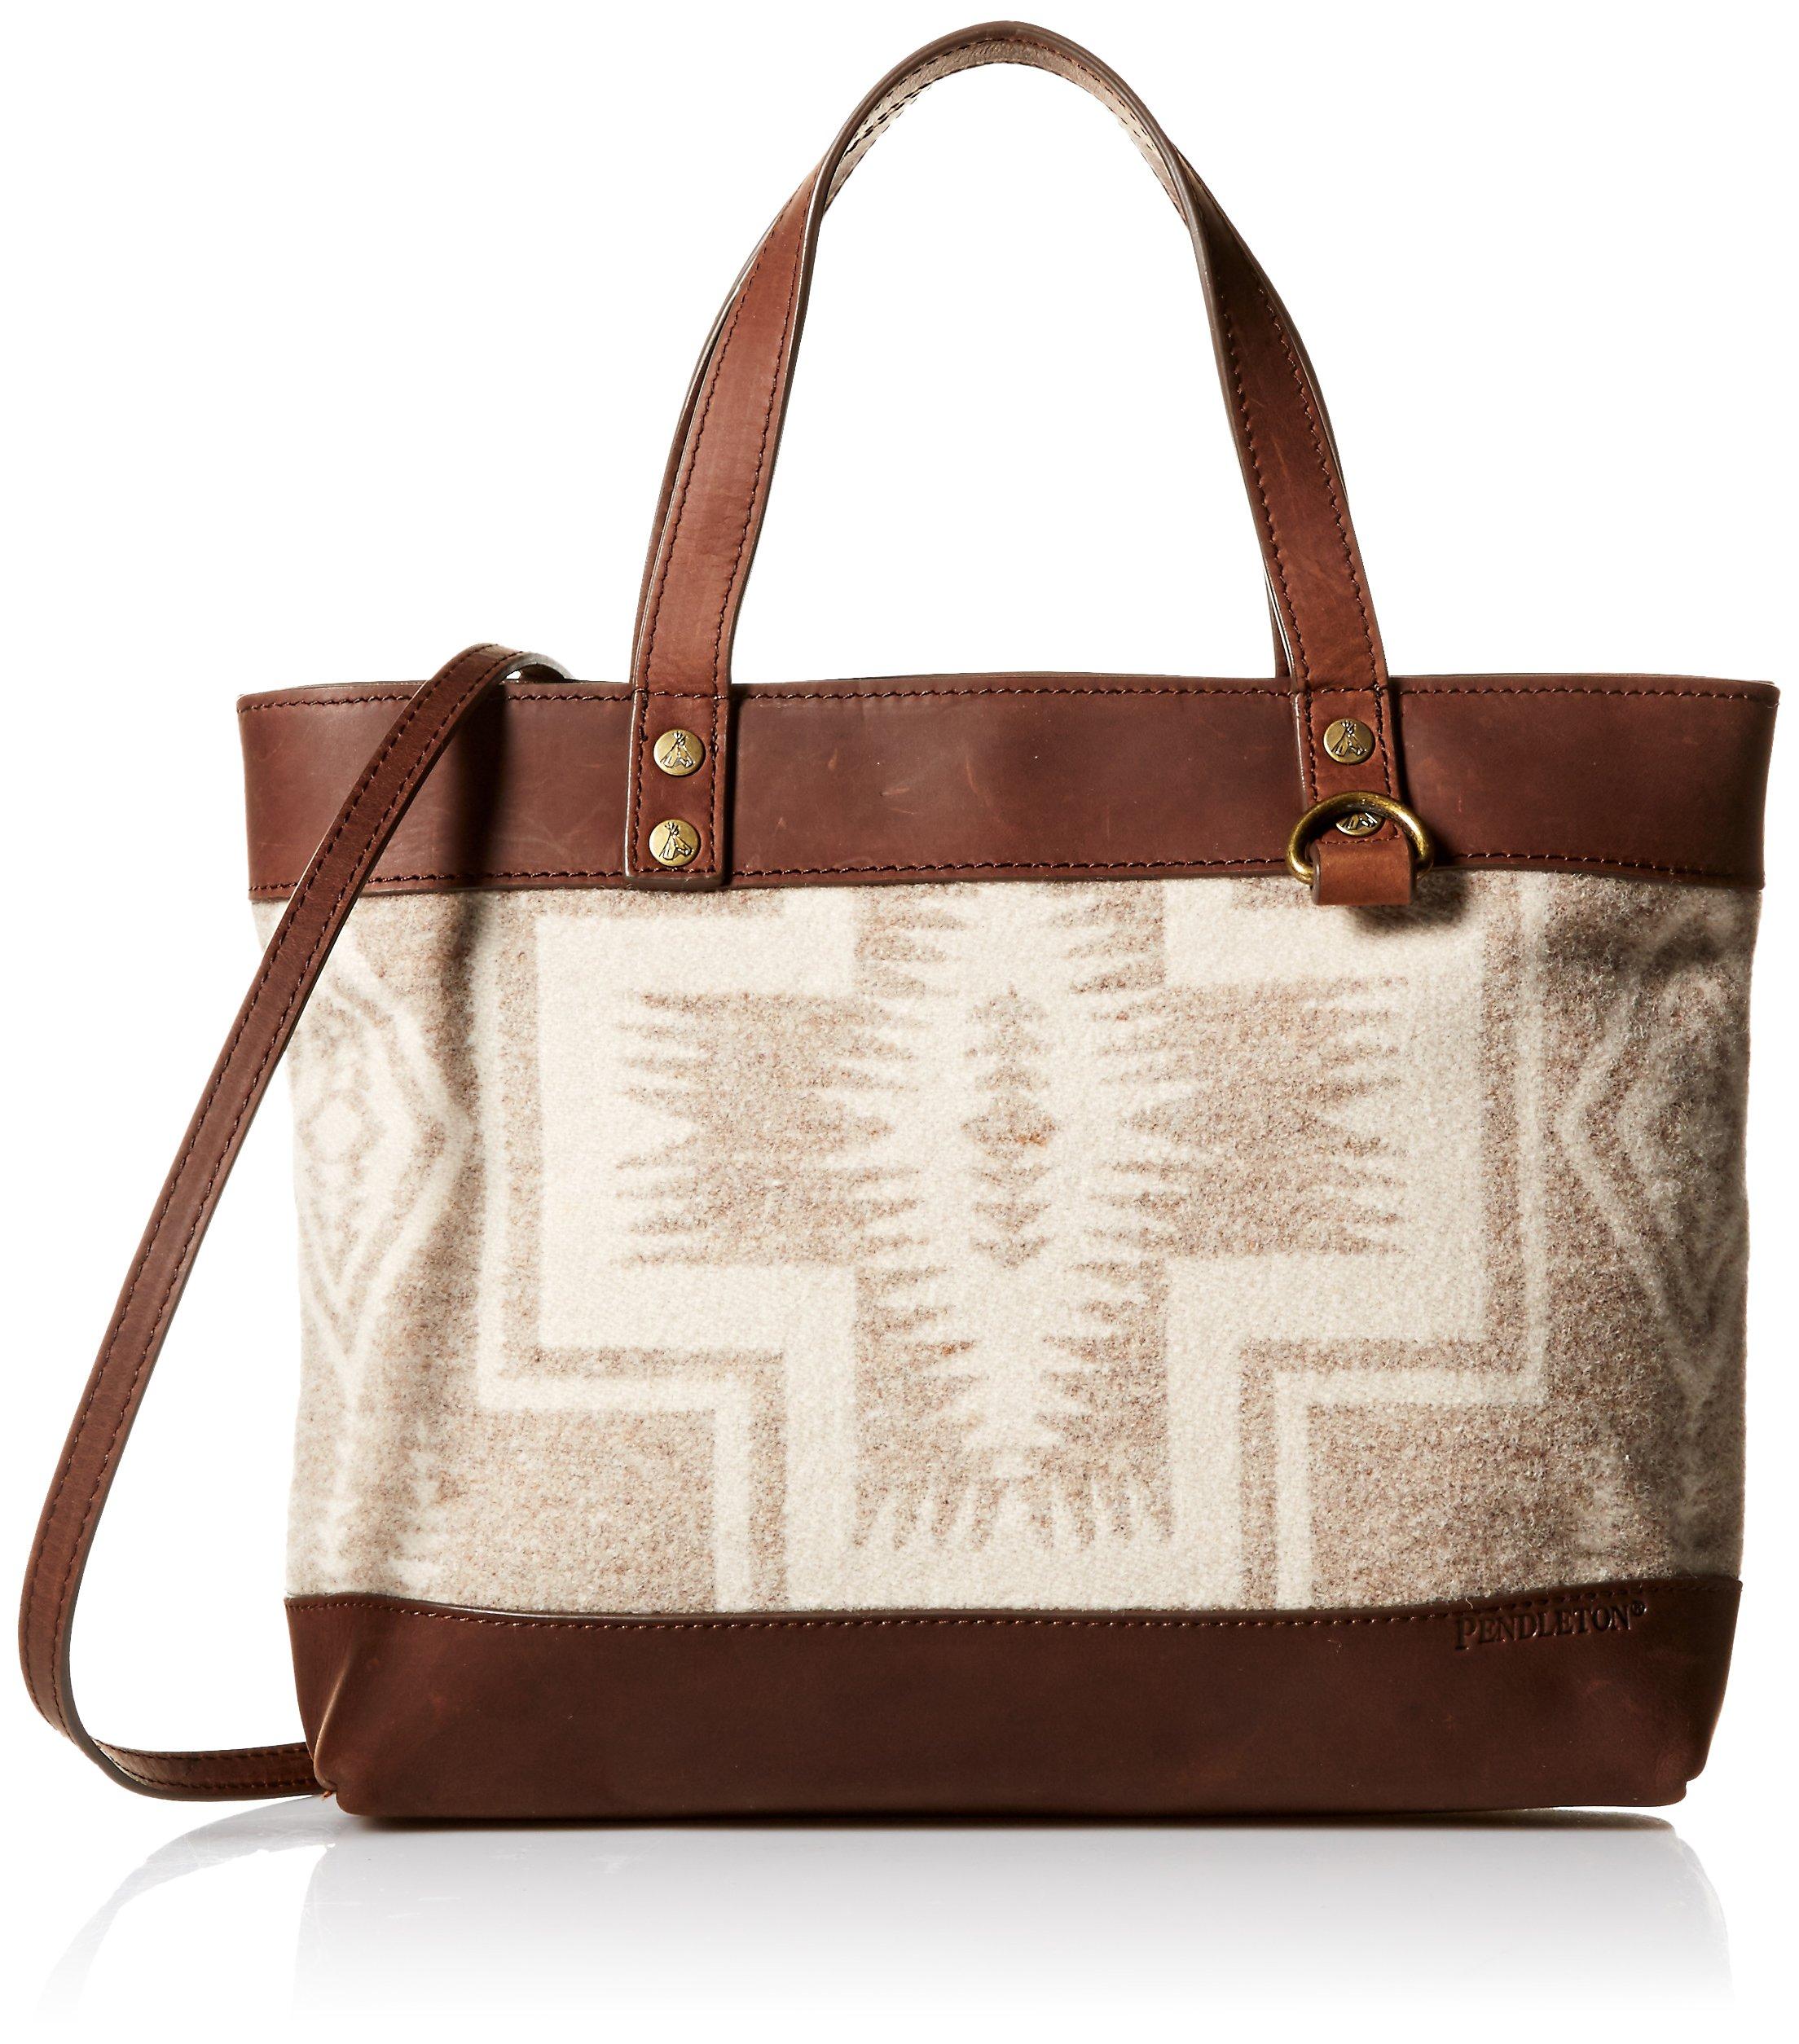 Pendleton Women's Tonal Wool Bag With Strap Accessory, -harding tonal, One Size by Pendleton